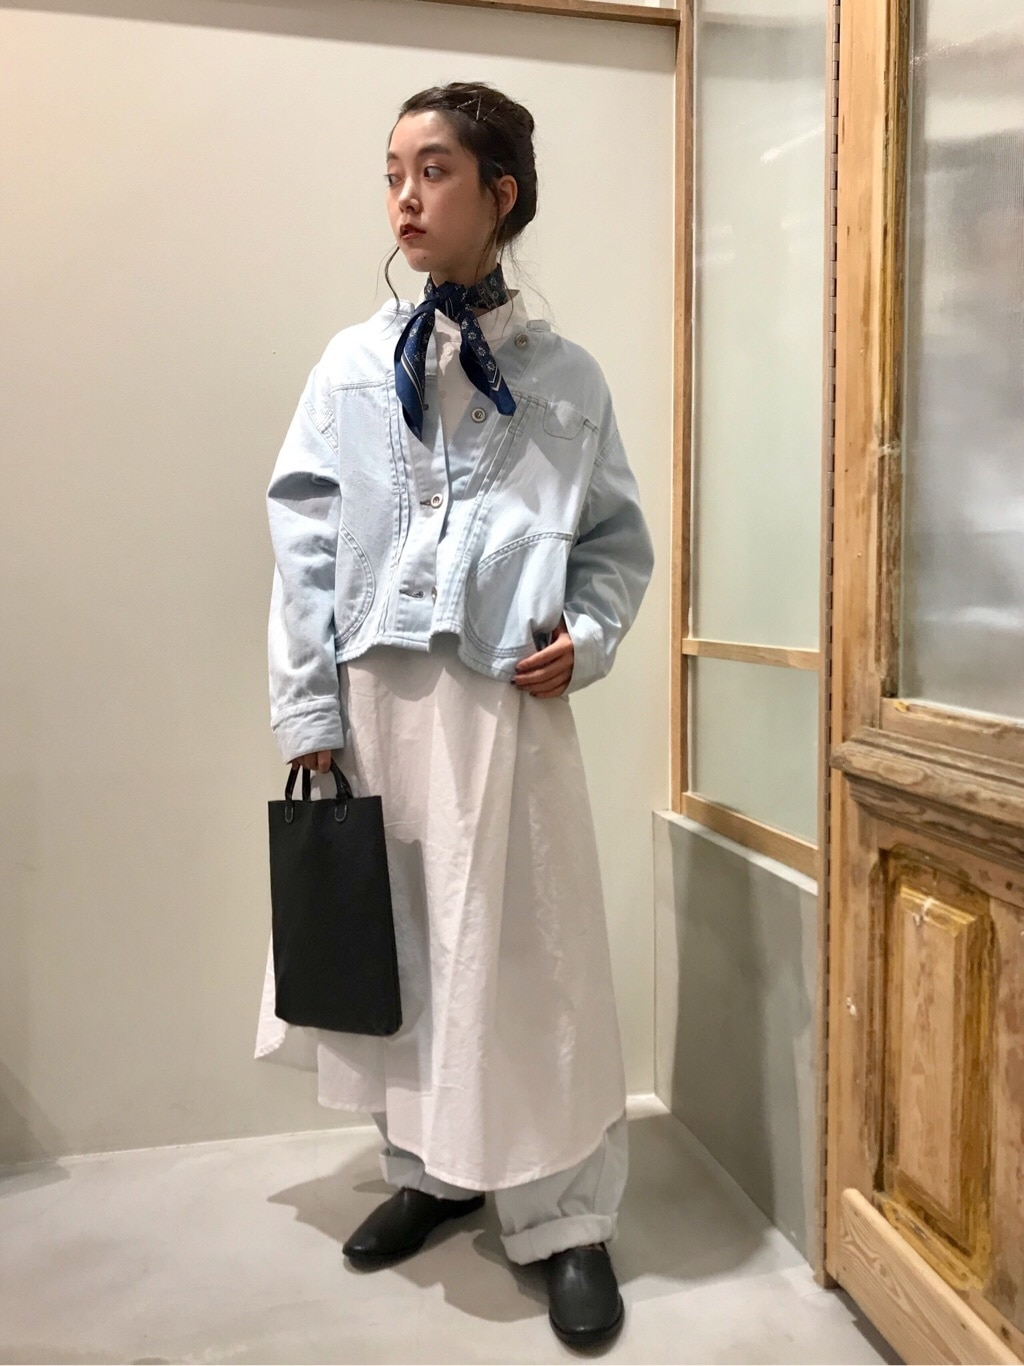 bulle de savon 渋谷スクランブルスクエア 身長:153cm 2020.09.02